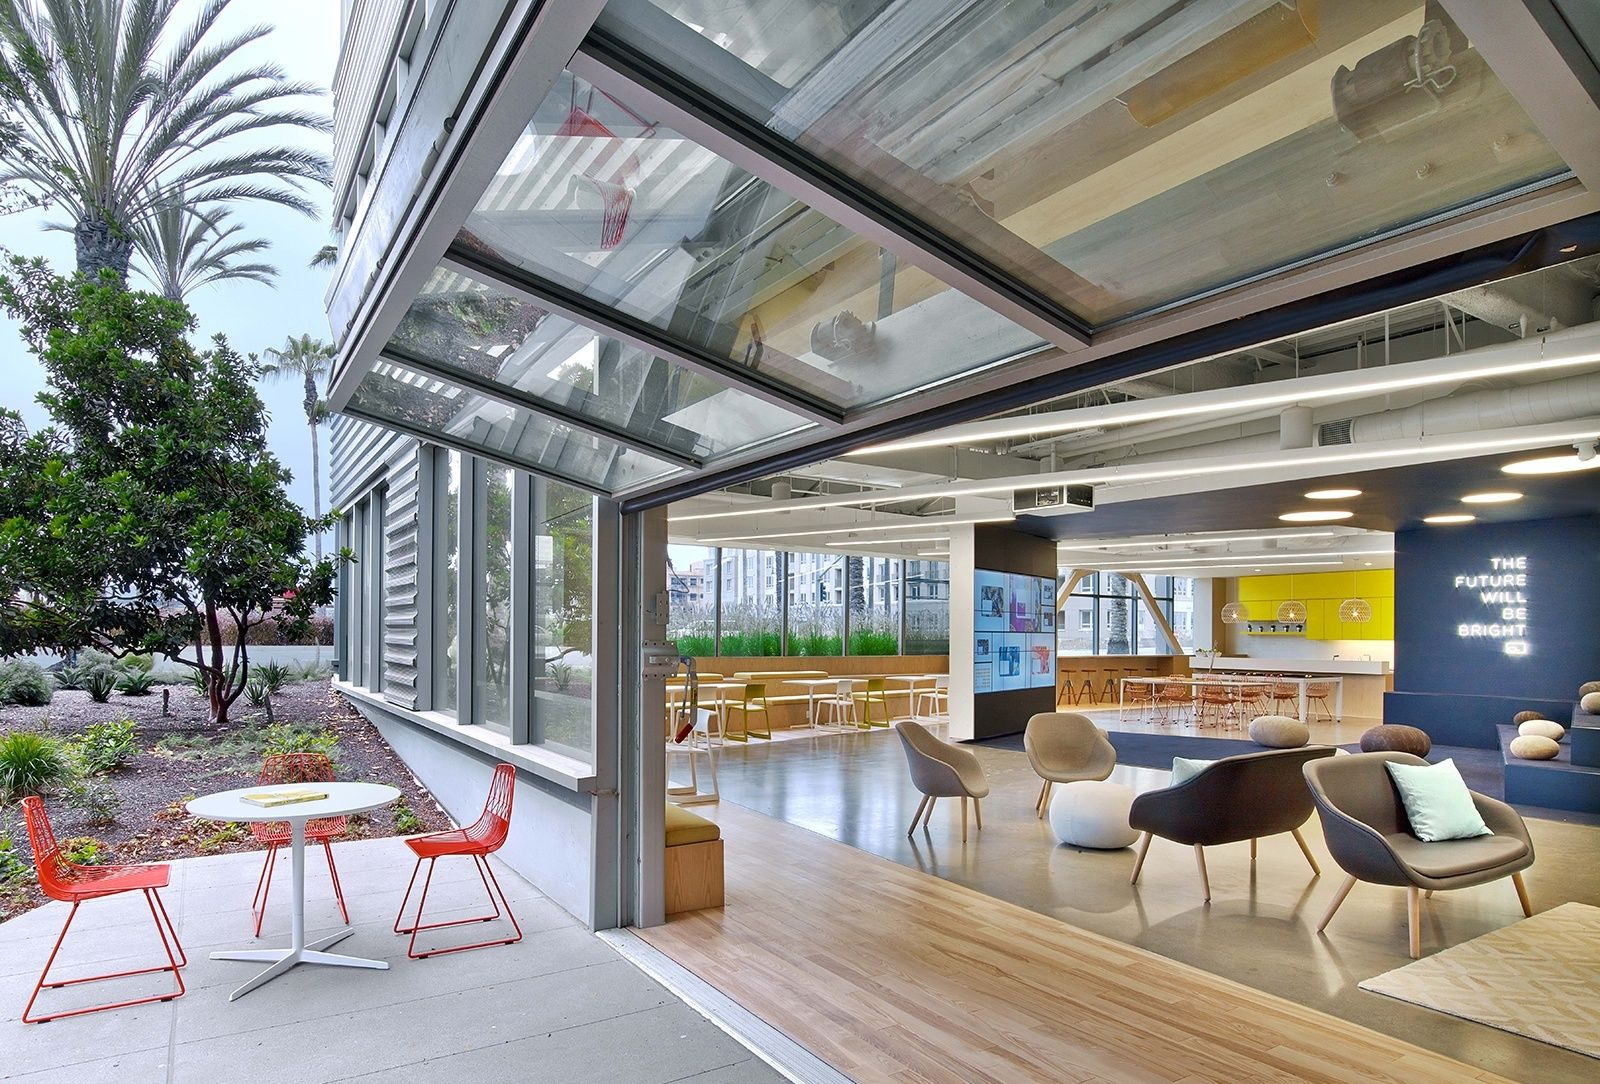 A Tour of Fullscreen's Super Cool Headquarters in Los